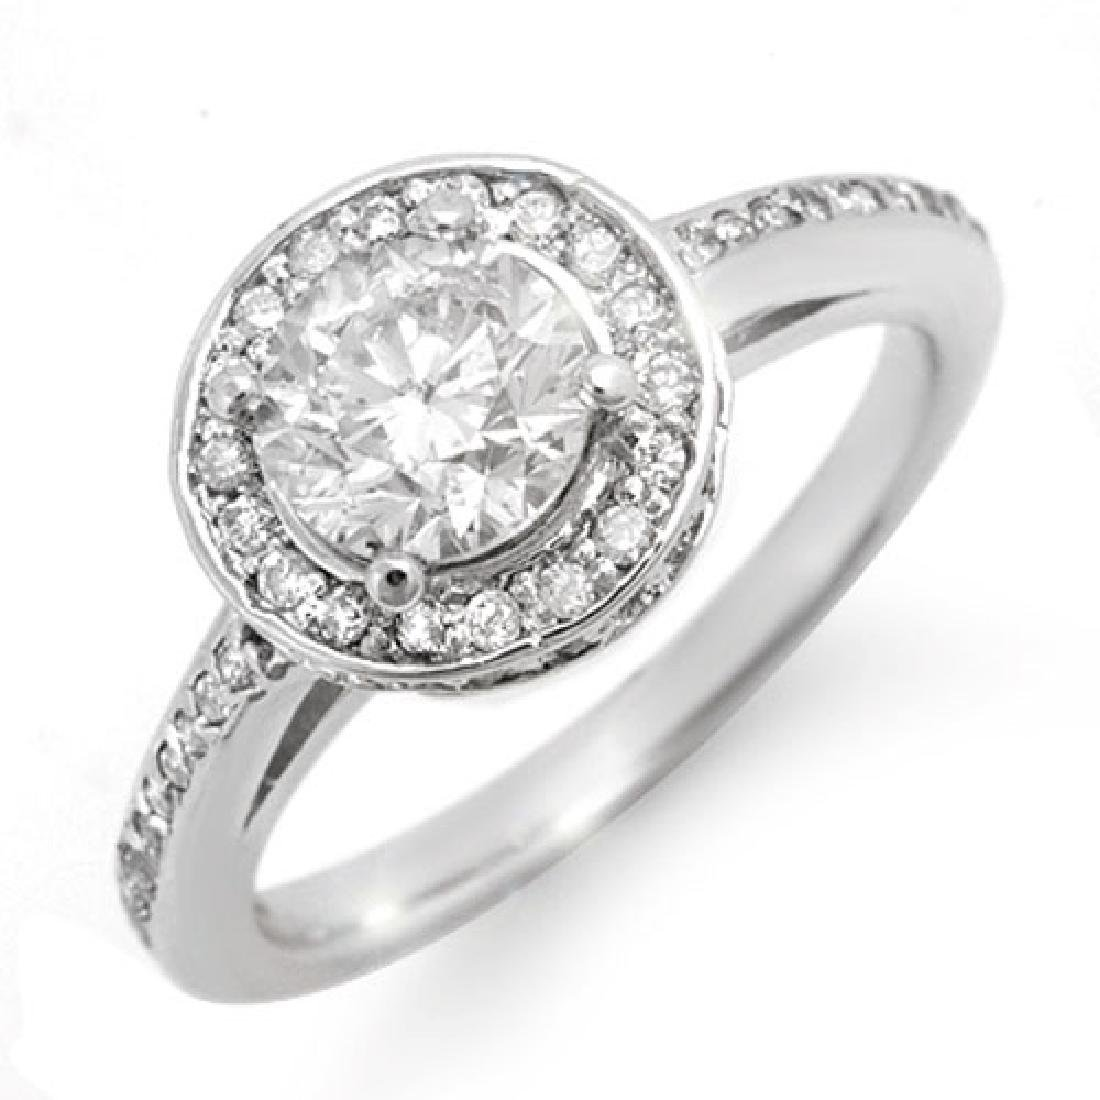 1.75 CTW Certified VS/SI Diamond Ring 18K White Gold